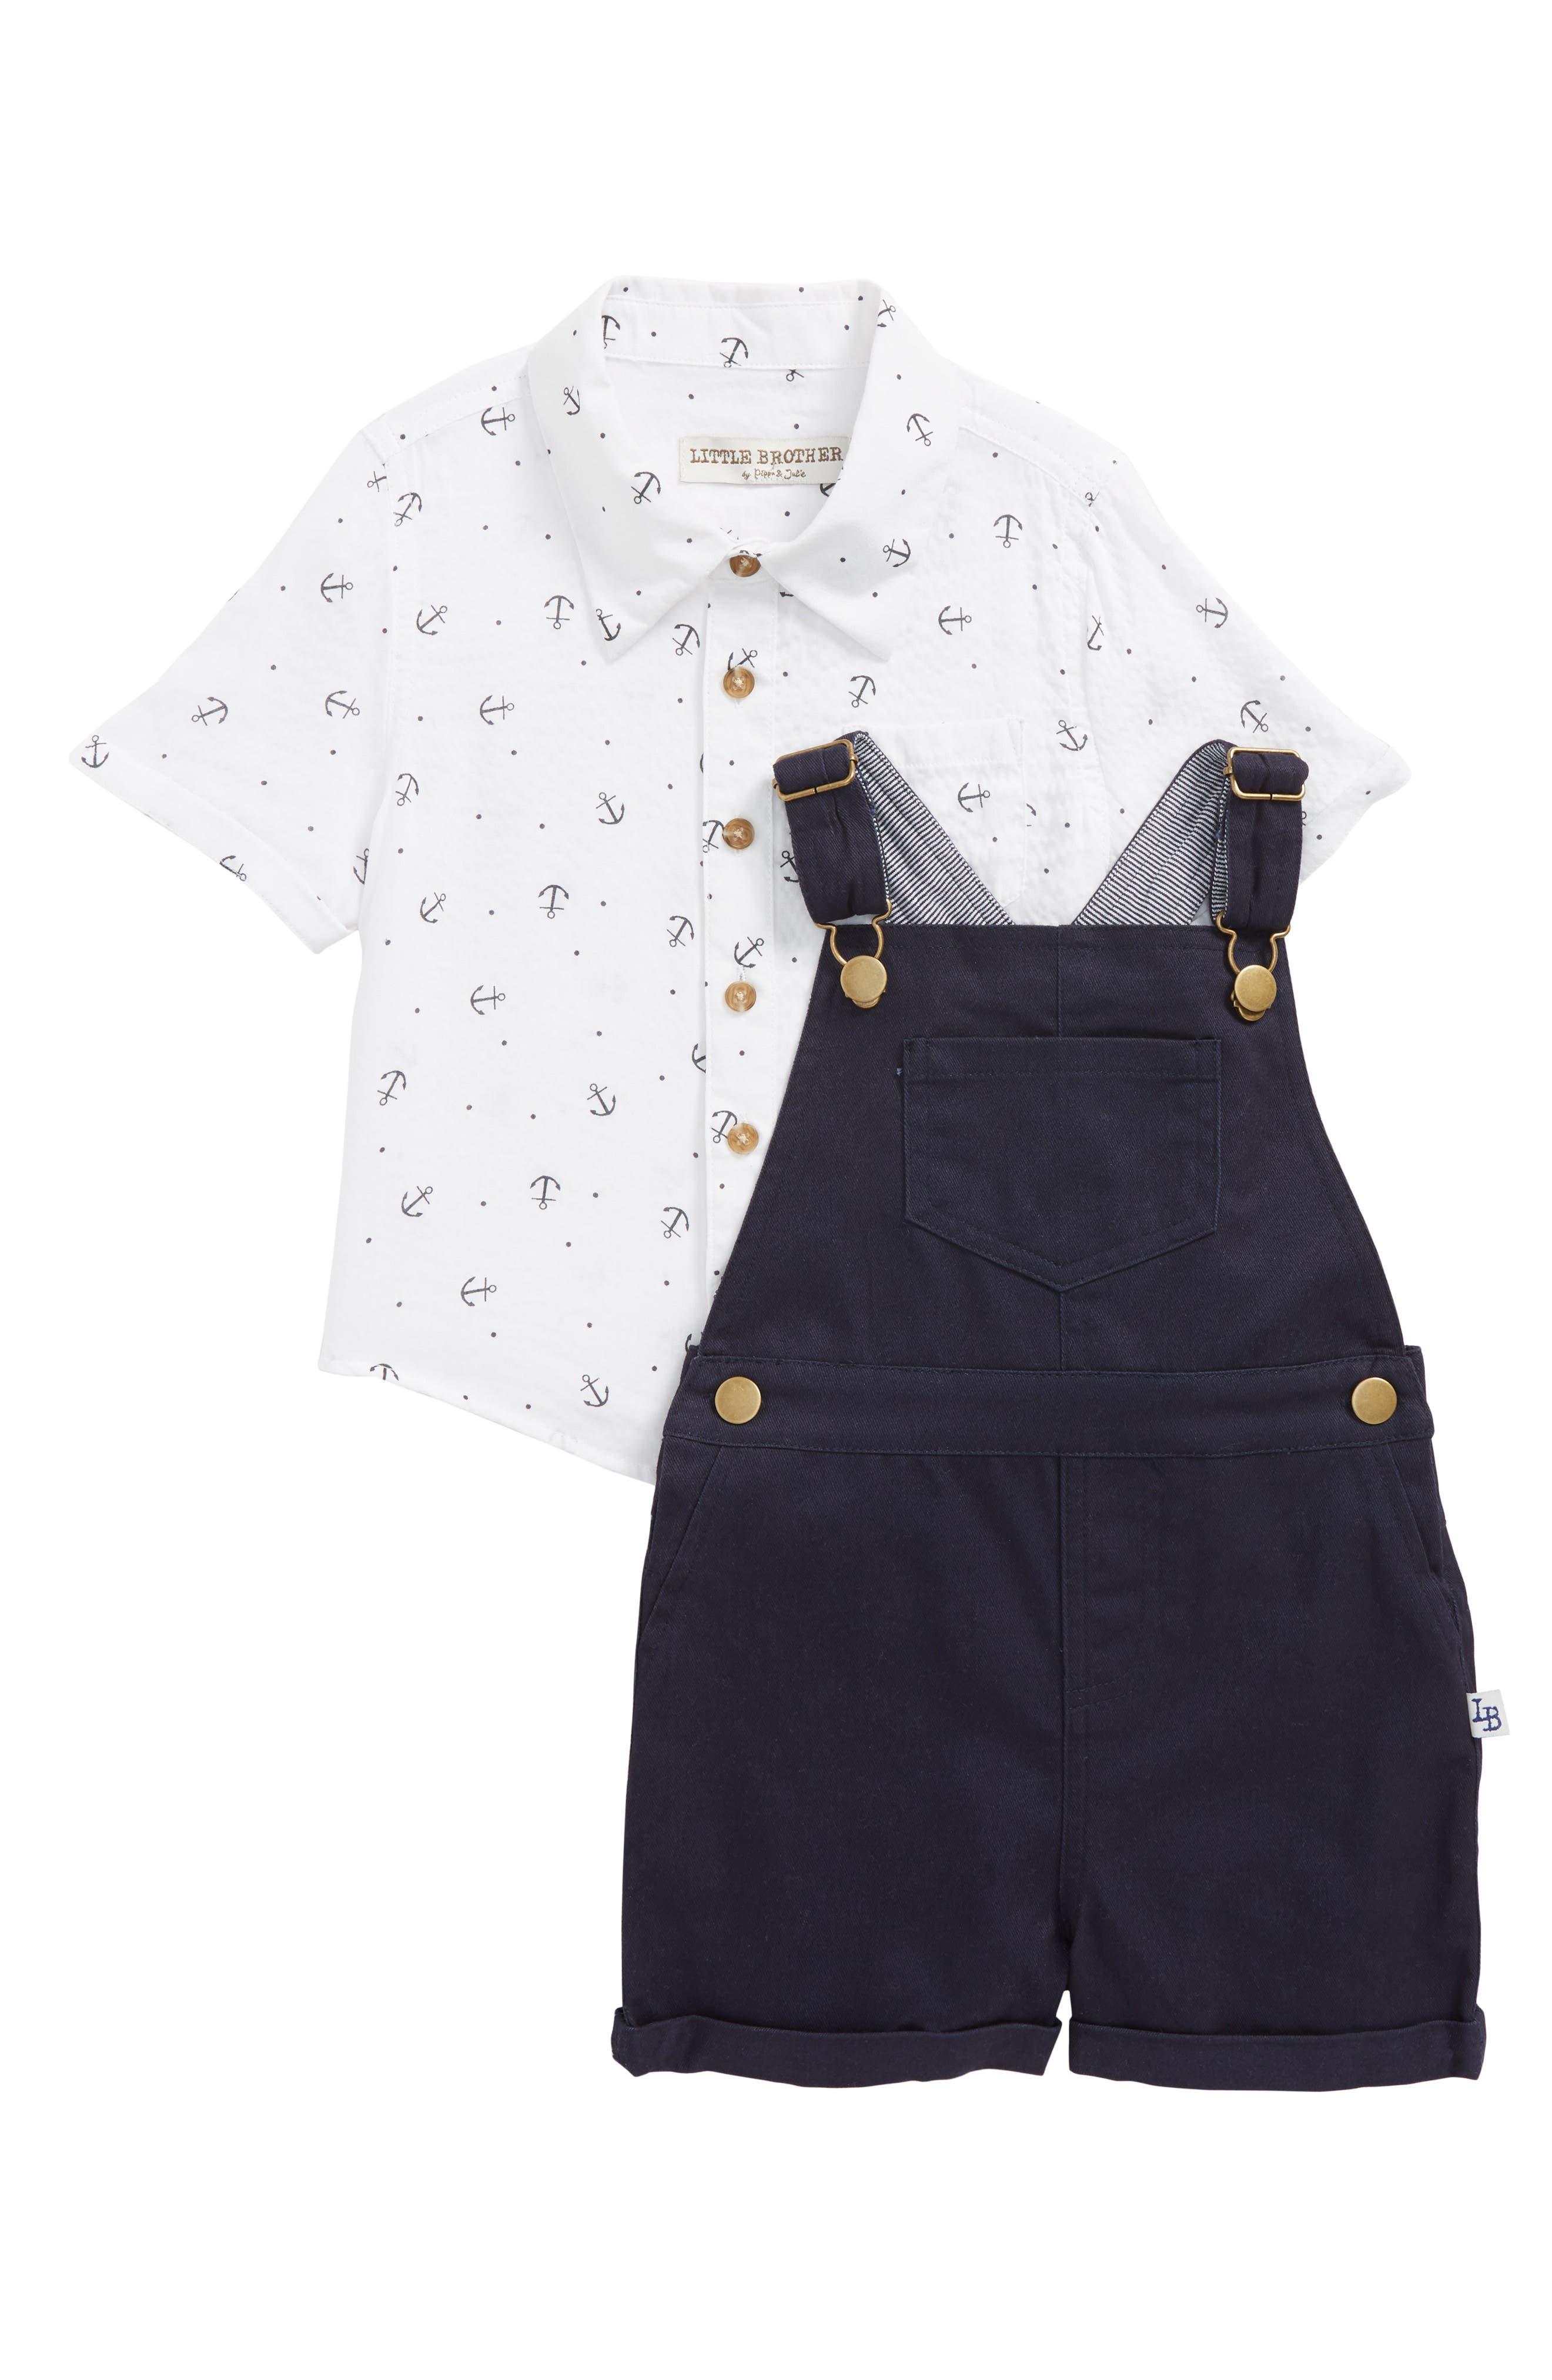 Little Brother by Pippa & Julie Print Shirt & Shortalls Set (Toddler Boys)